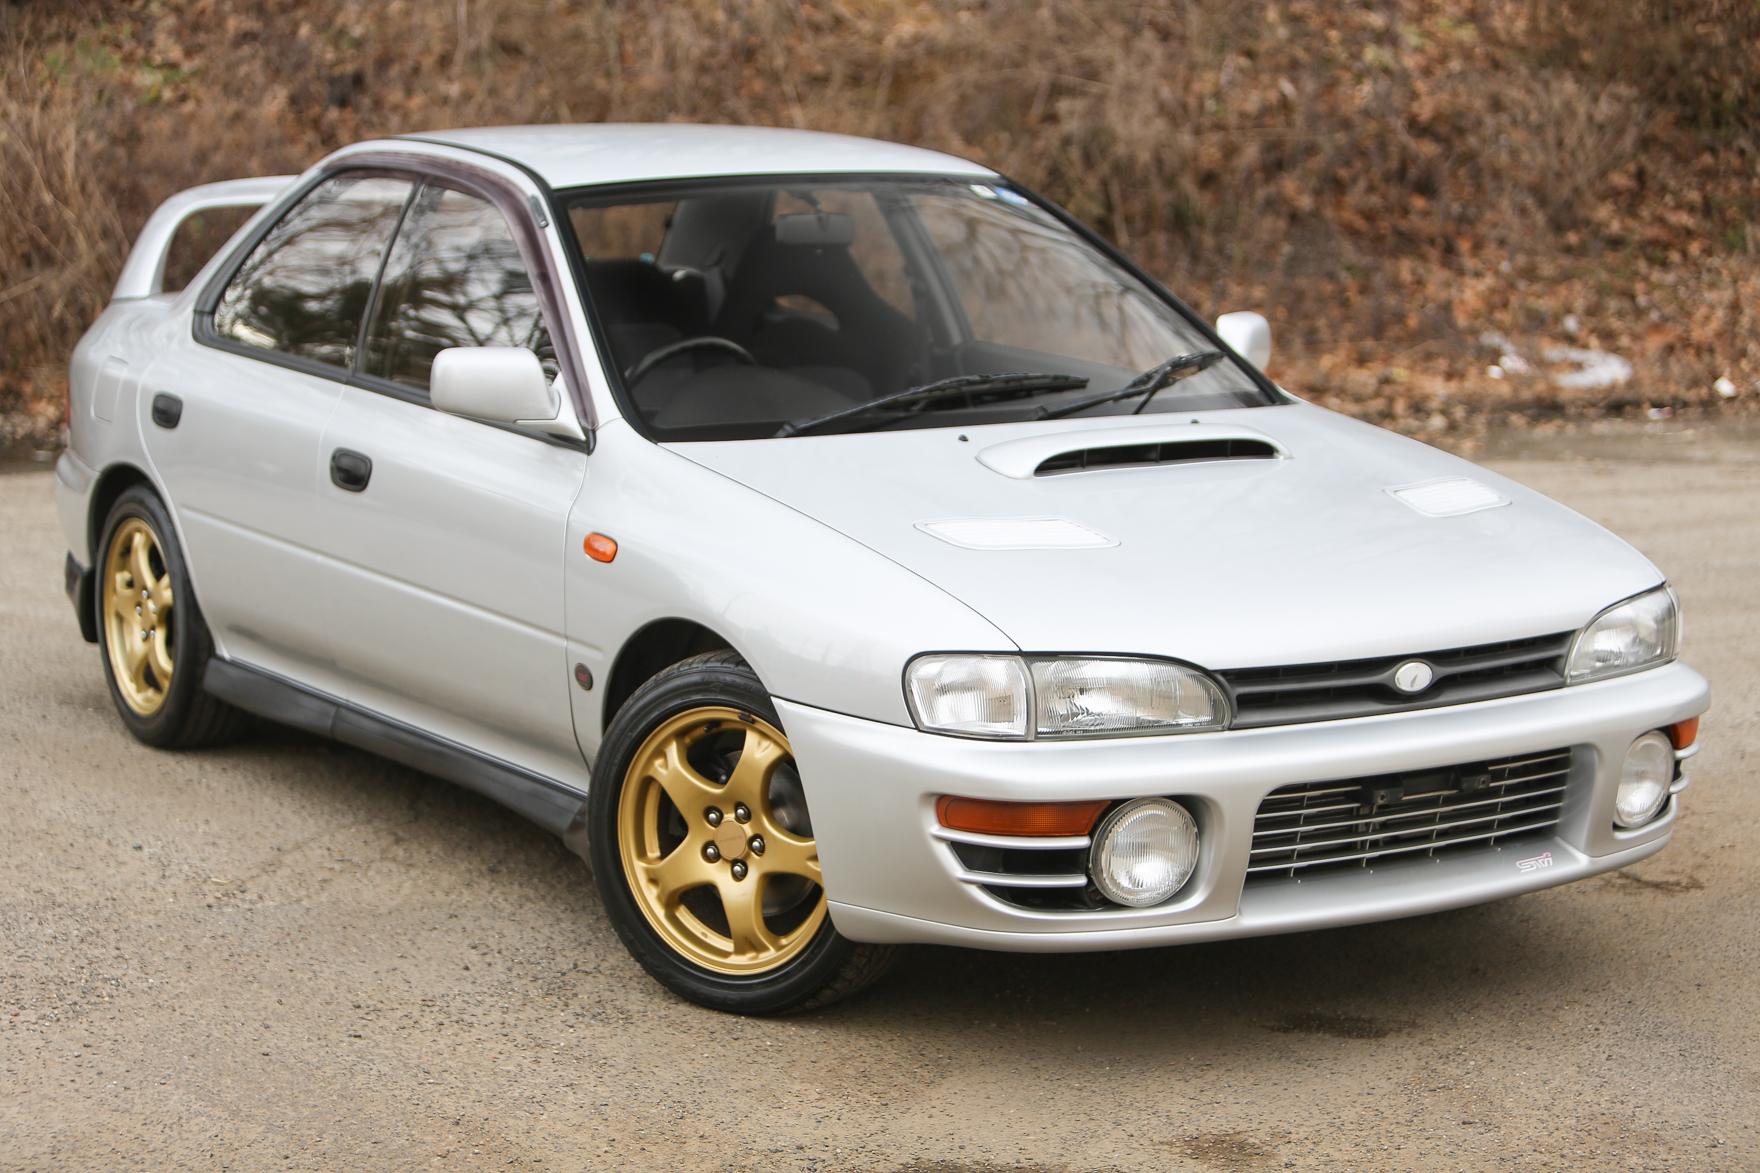 1994 Subaru Impreza WRX STI Special Edition - GOING TO COLLECTOR CAR AUCTION